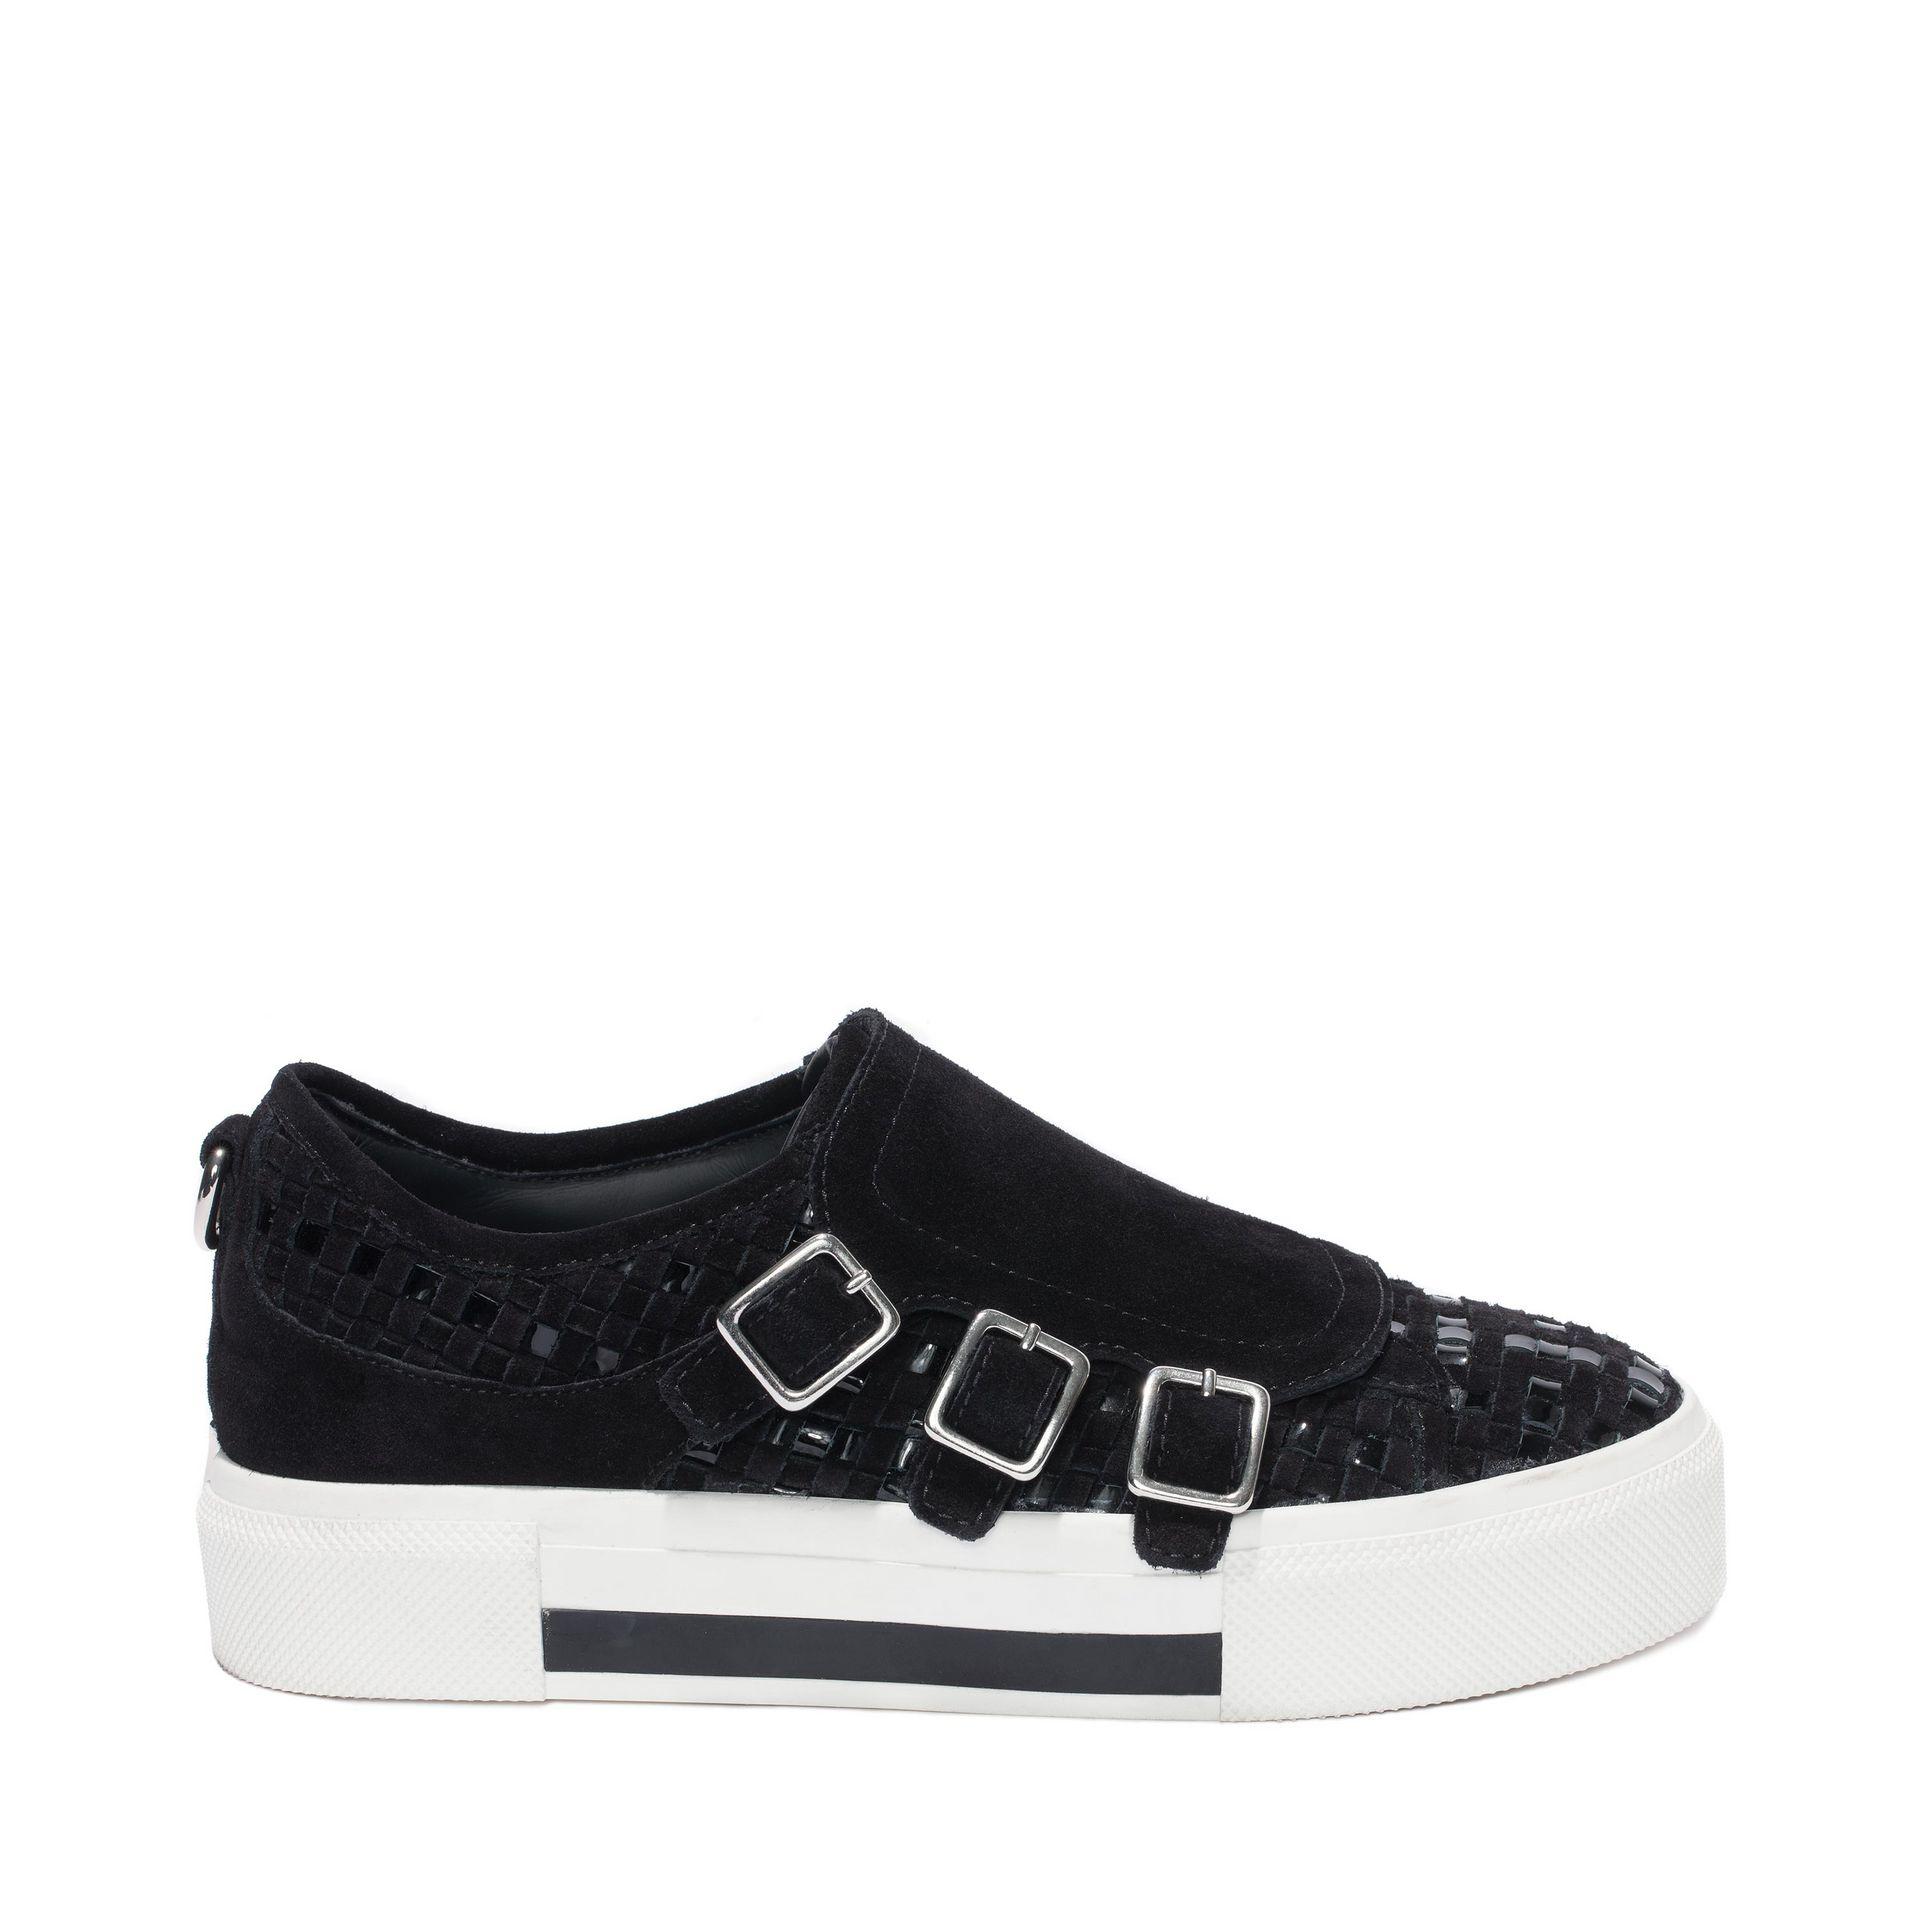 alexander mcqueen 3 buckle sneaker in black lyst. Black Bedroom Furniture Sets. Home Design Ideas